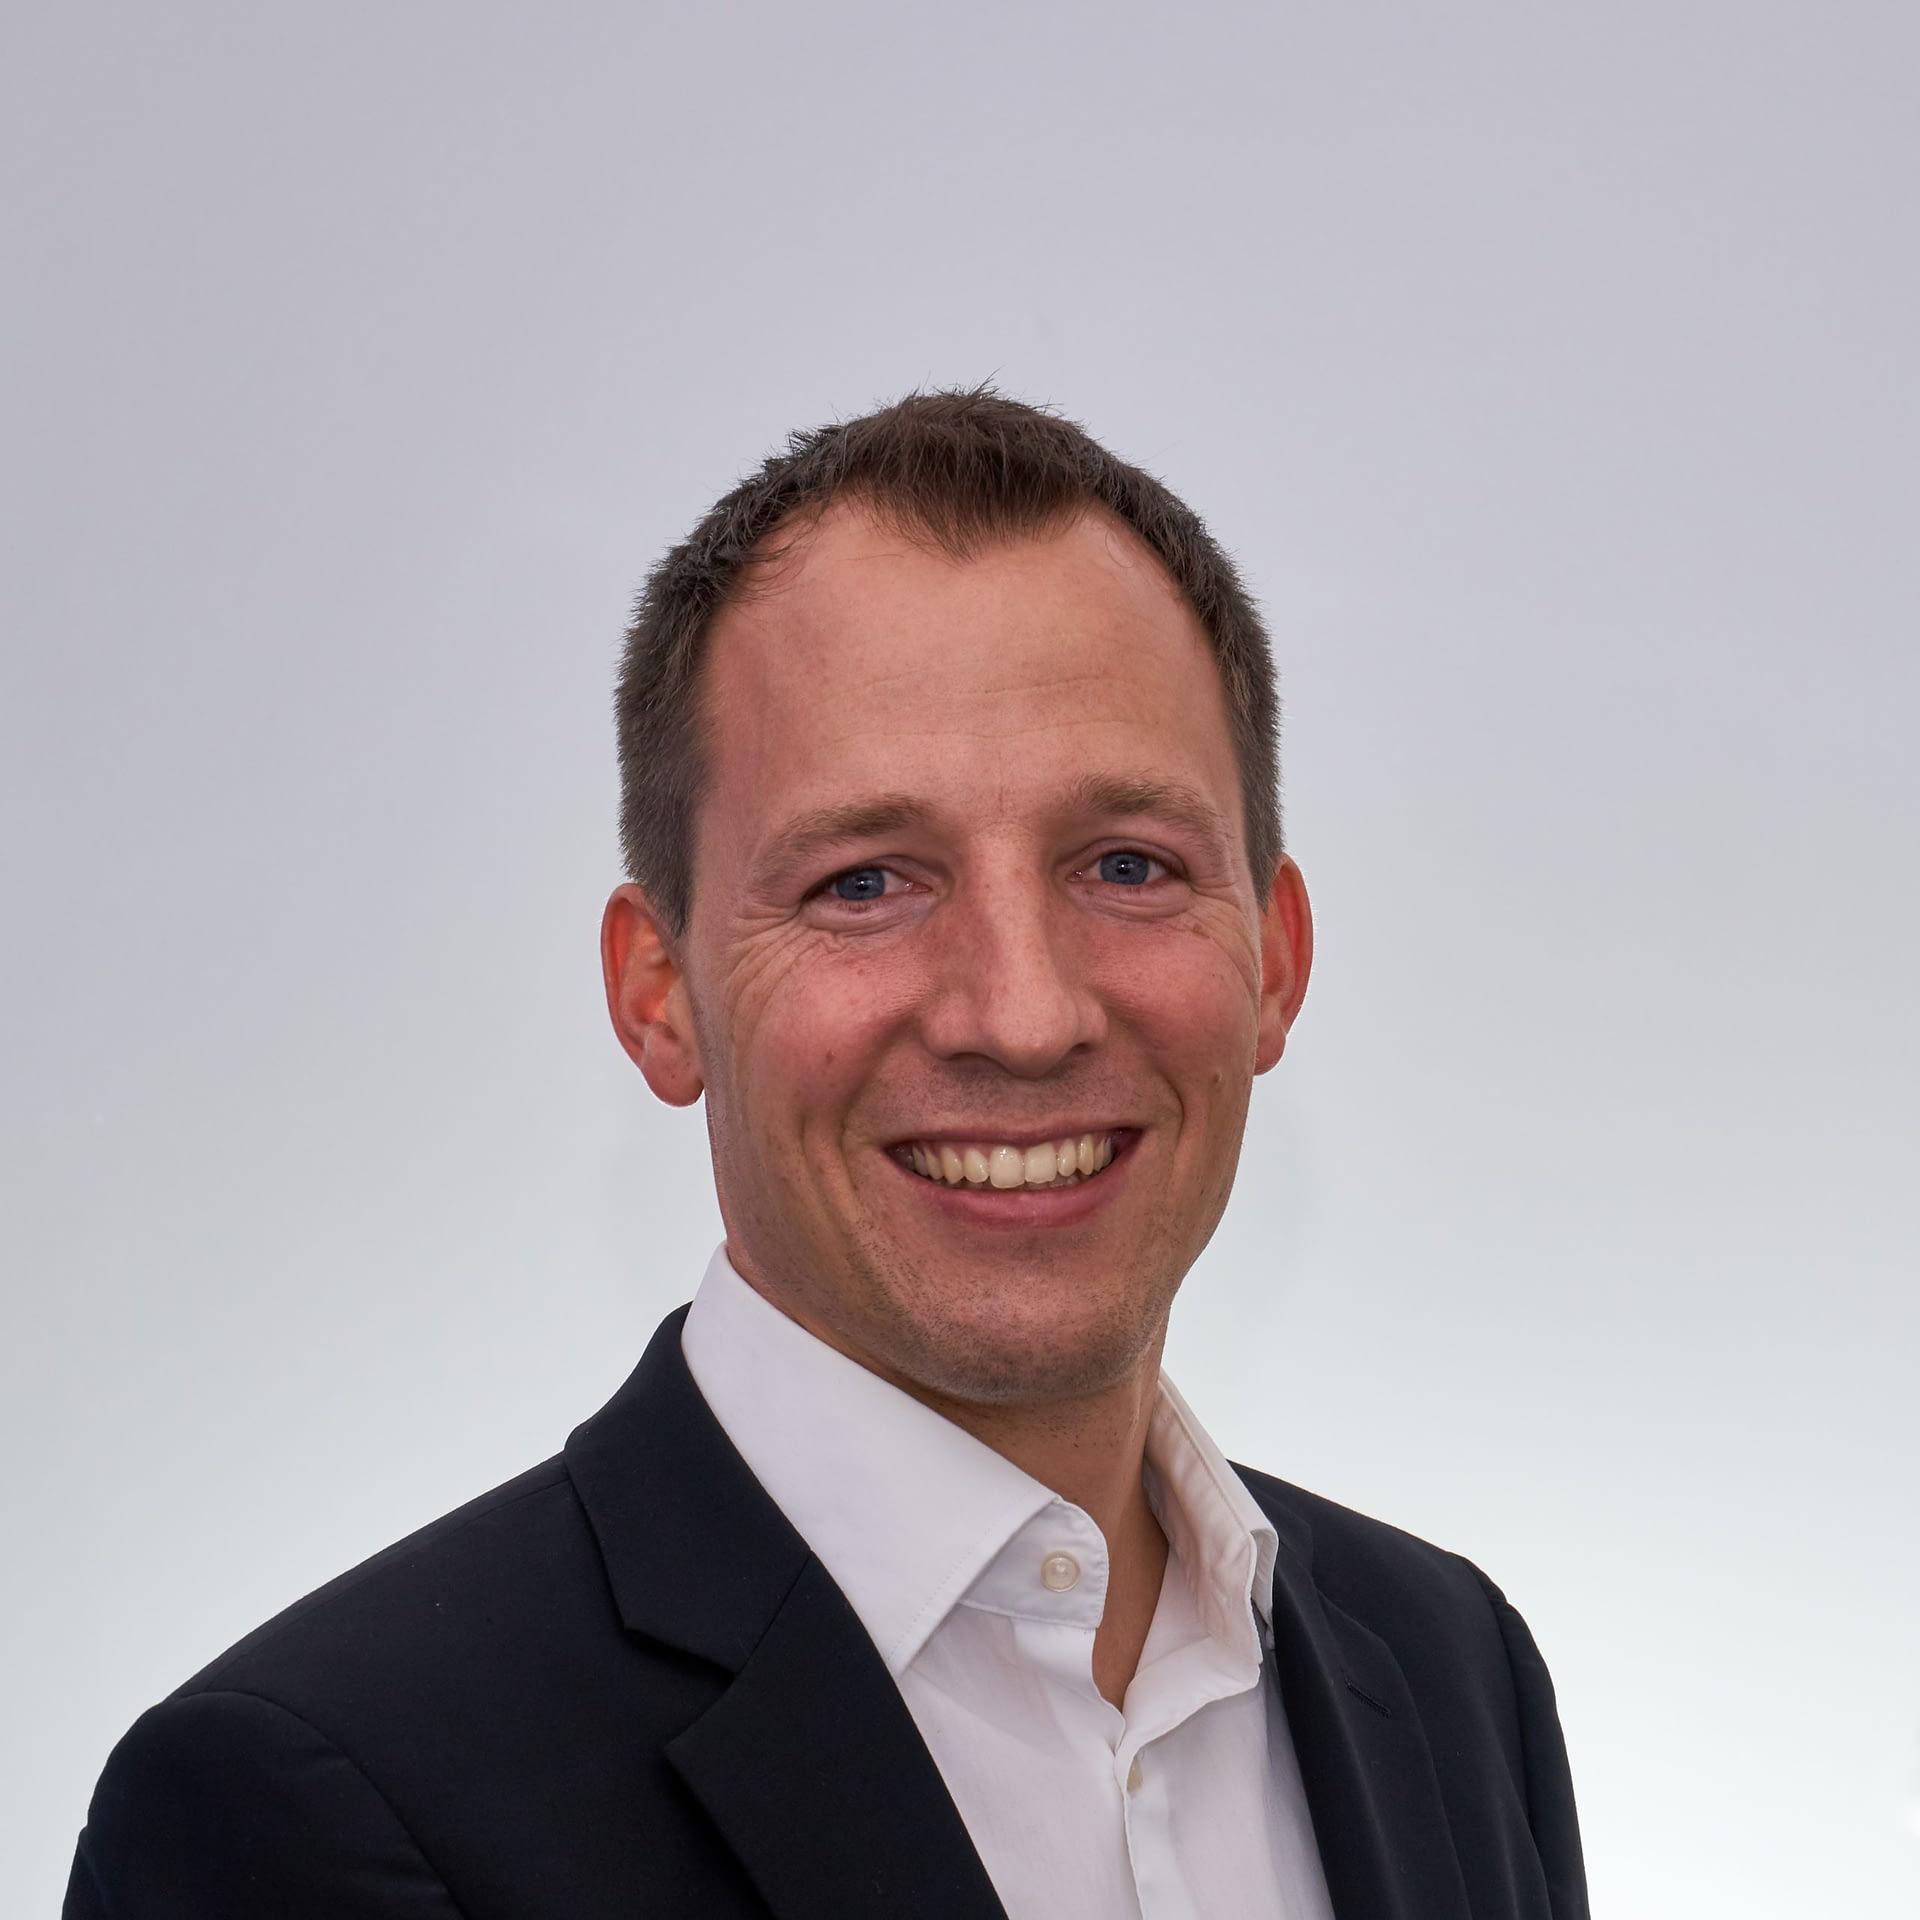 Dr.-Ing. Markus Schiefer